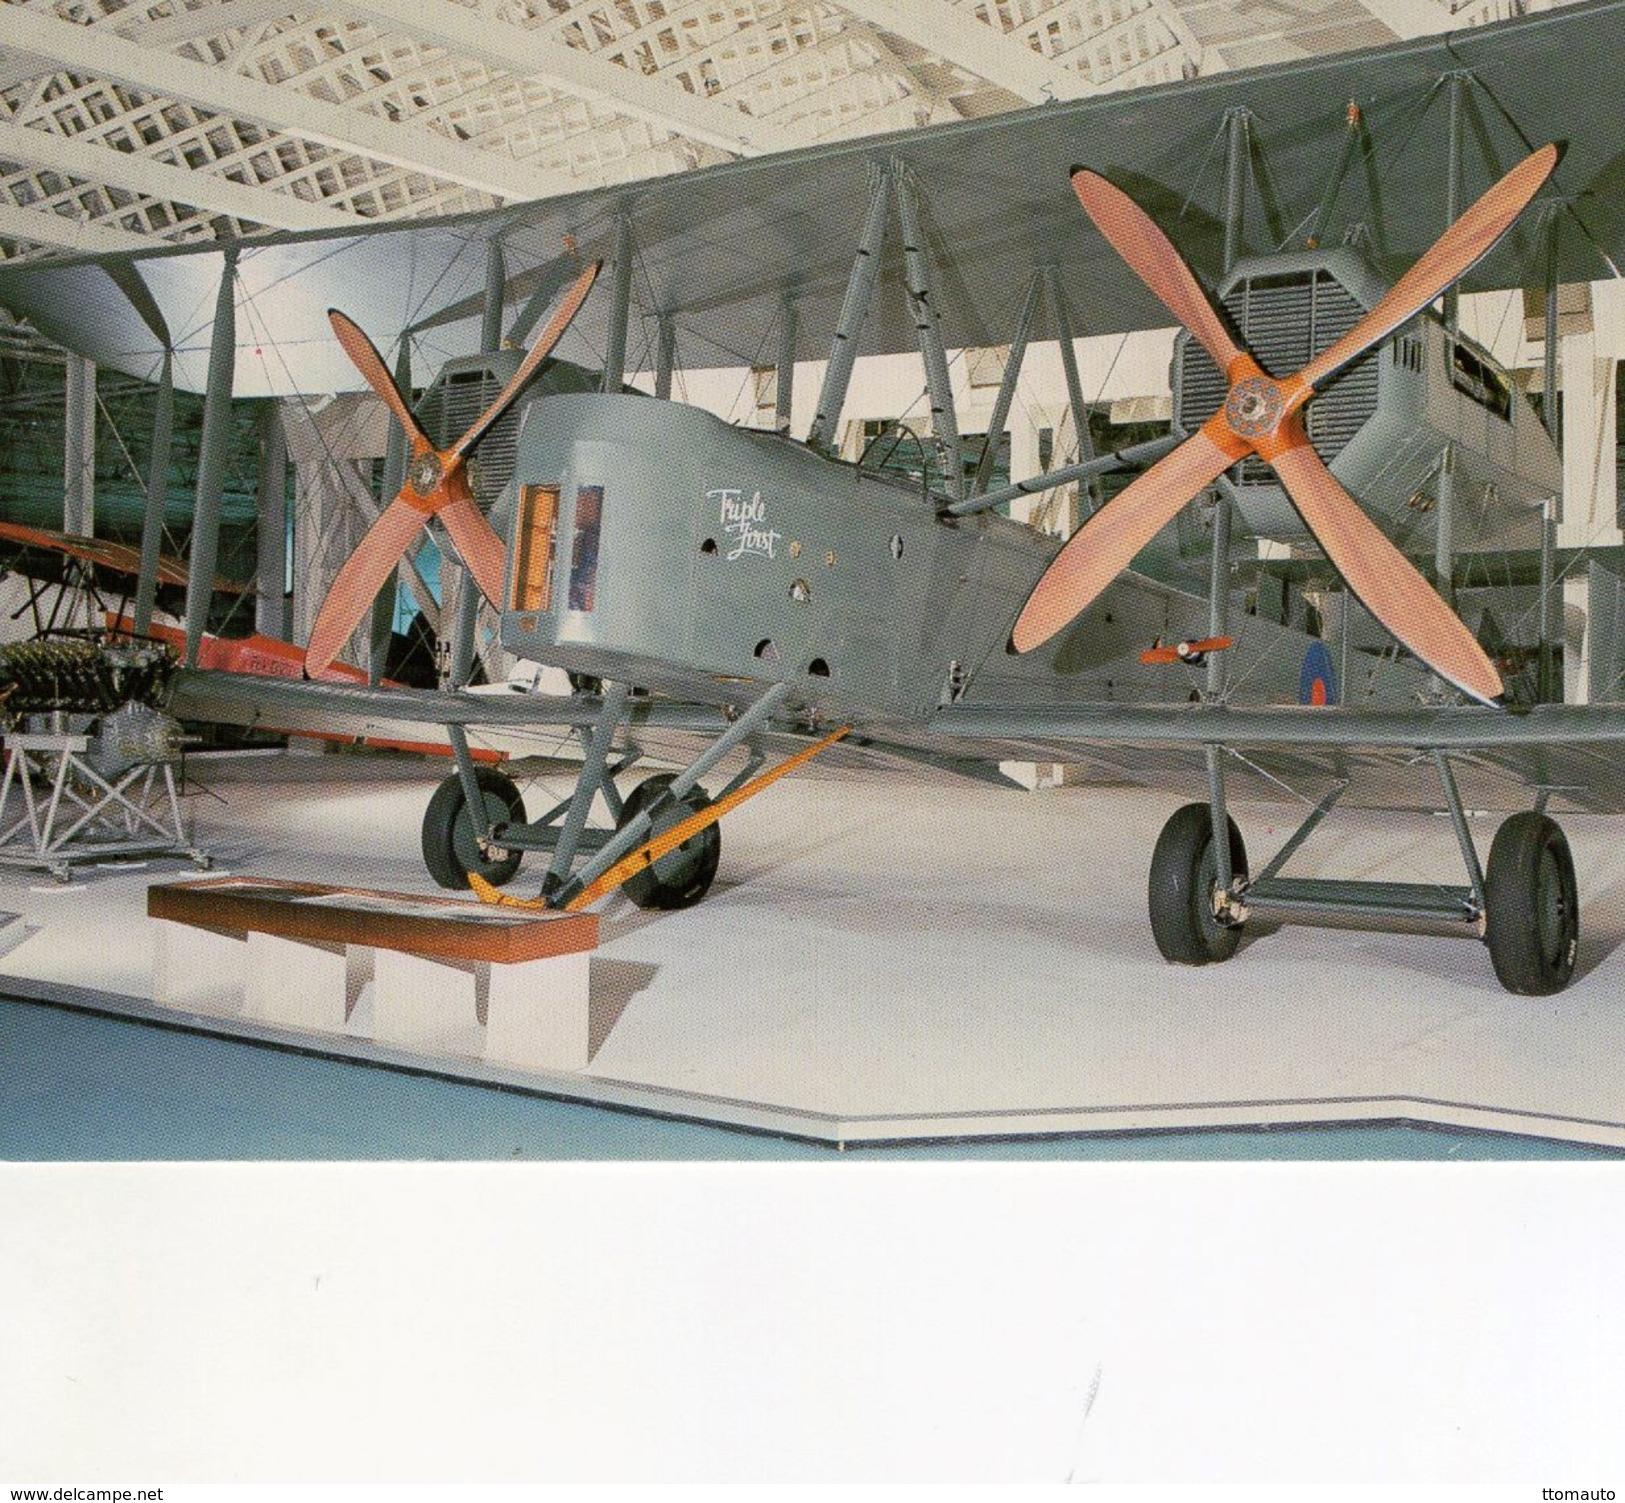 Vickers FB-27A 'Vimy' Bomber  -  1918  -  Carte Postale - 1914-1918: 1a Guerra